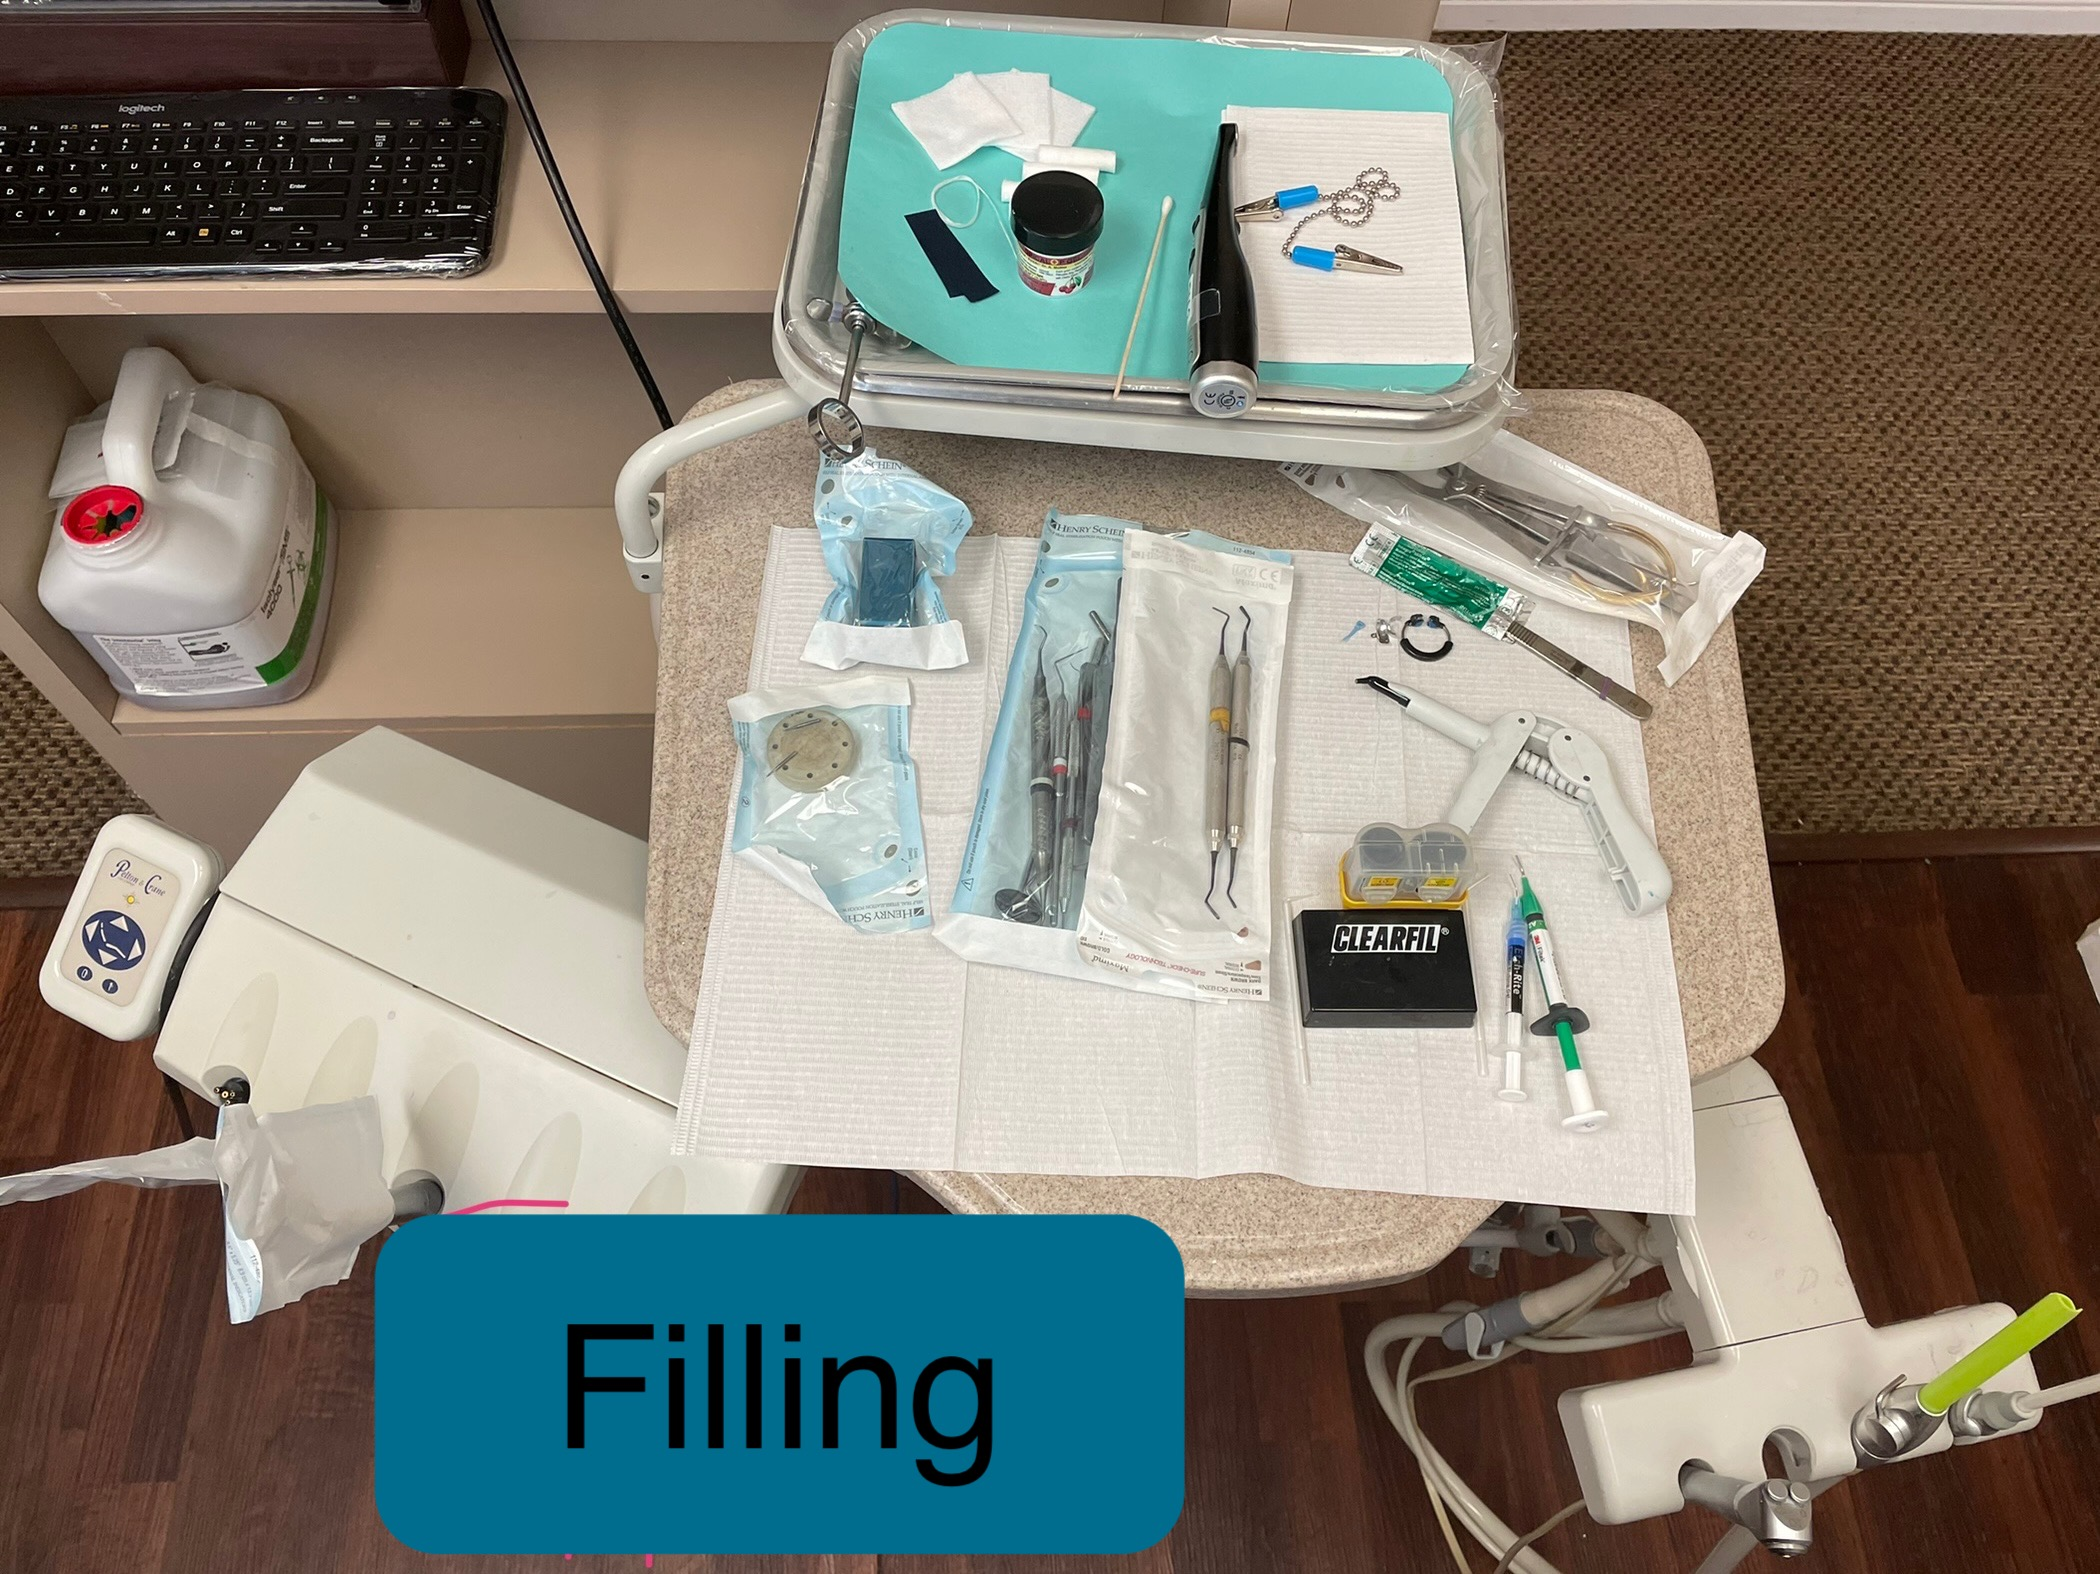 Filling Sample